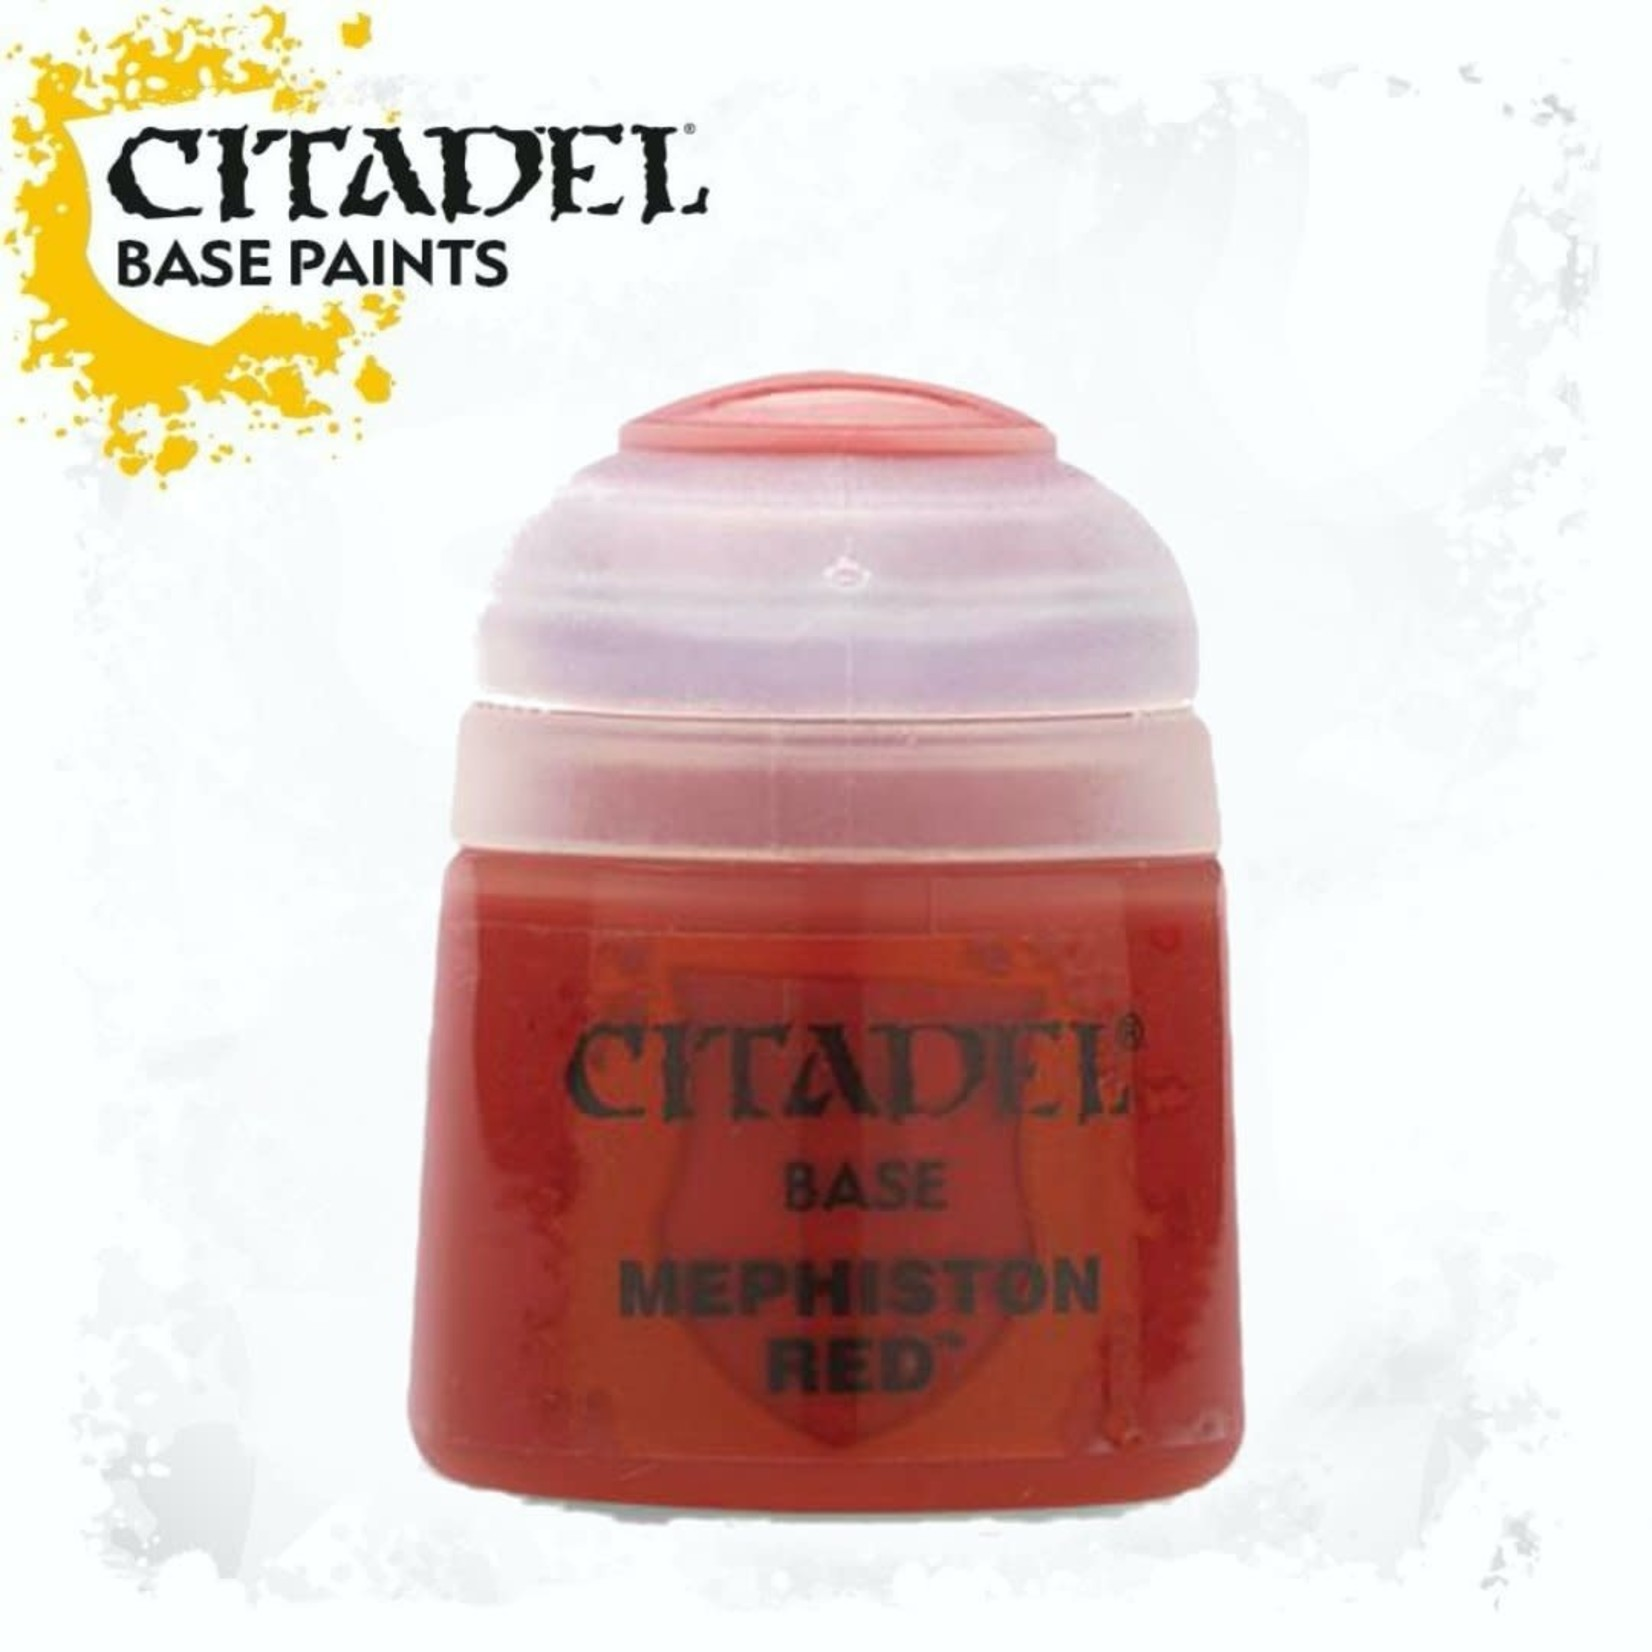 Citadel Citadel Paint - Base: Mephiston Red